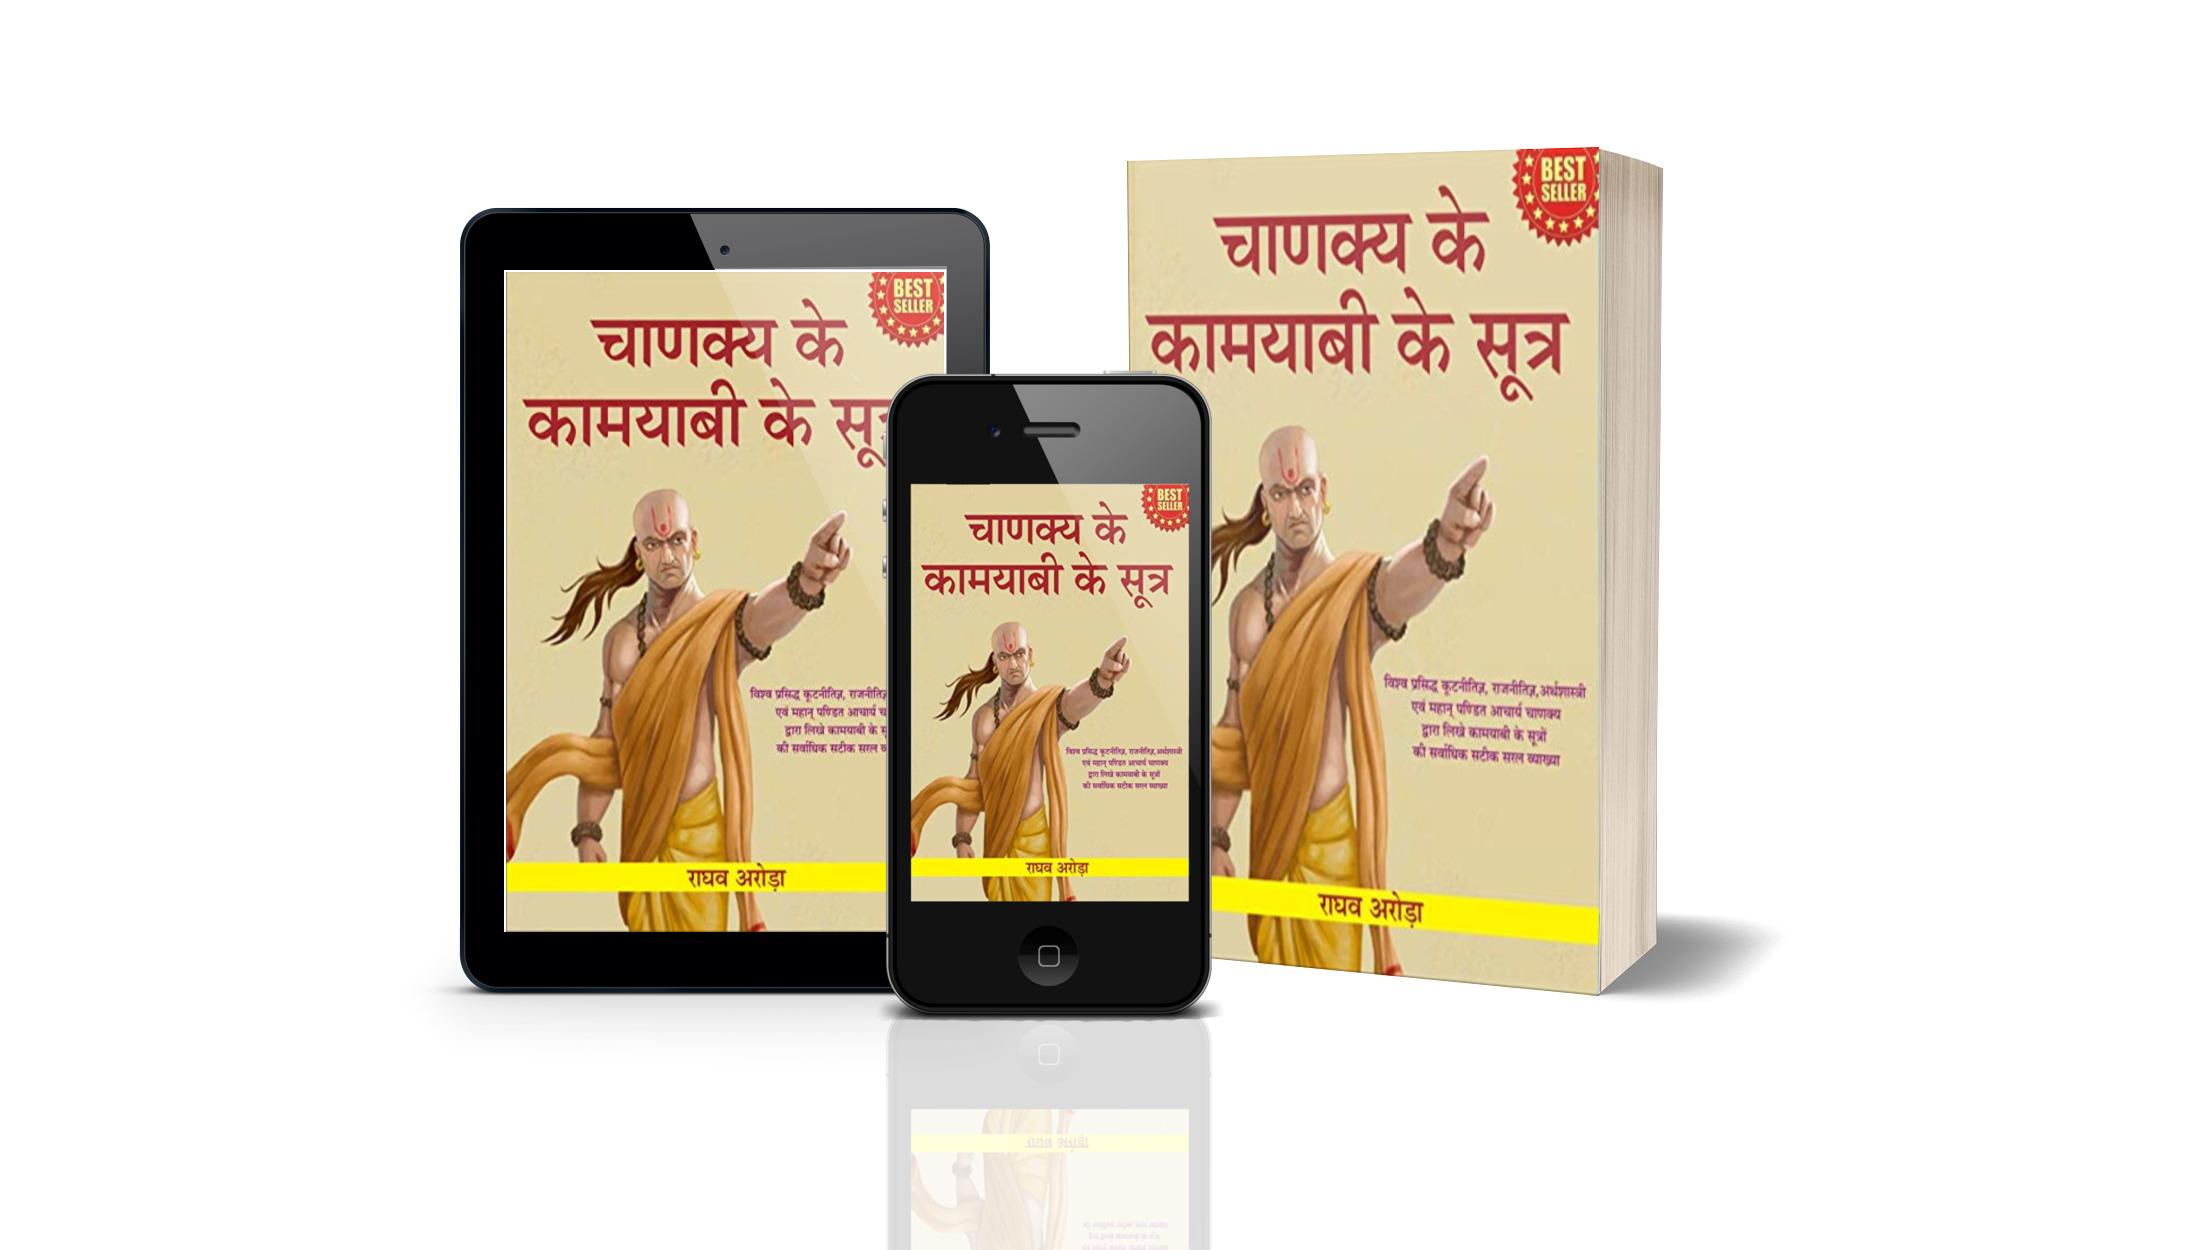 Chanakya Ke Kamyabi ke Sutra